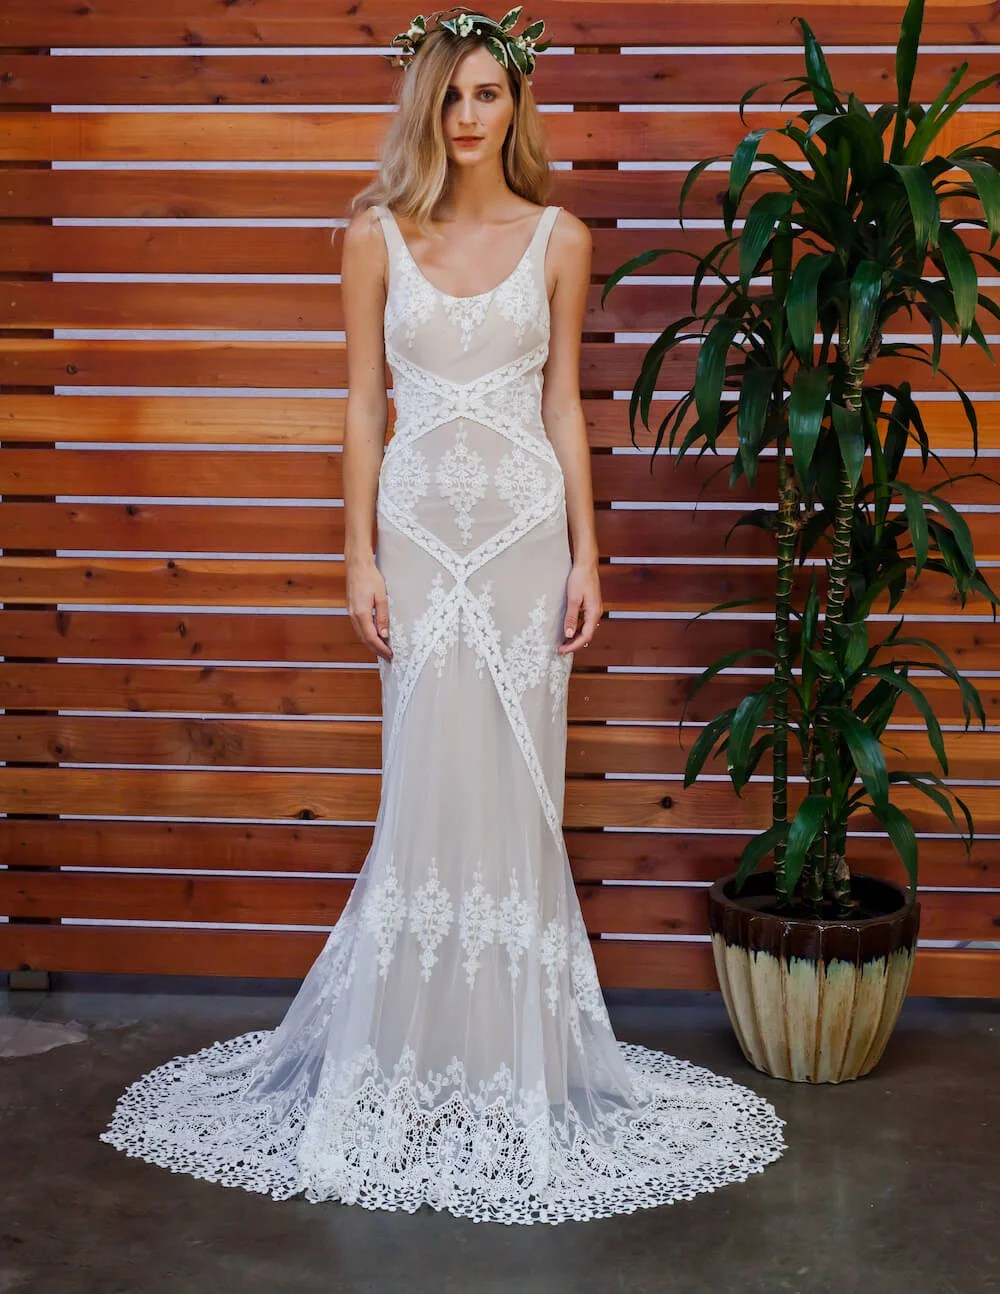 cecilia mixed lace bohemian boho wedding dress dreamers and lovers bohemian lace wedding dress with